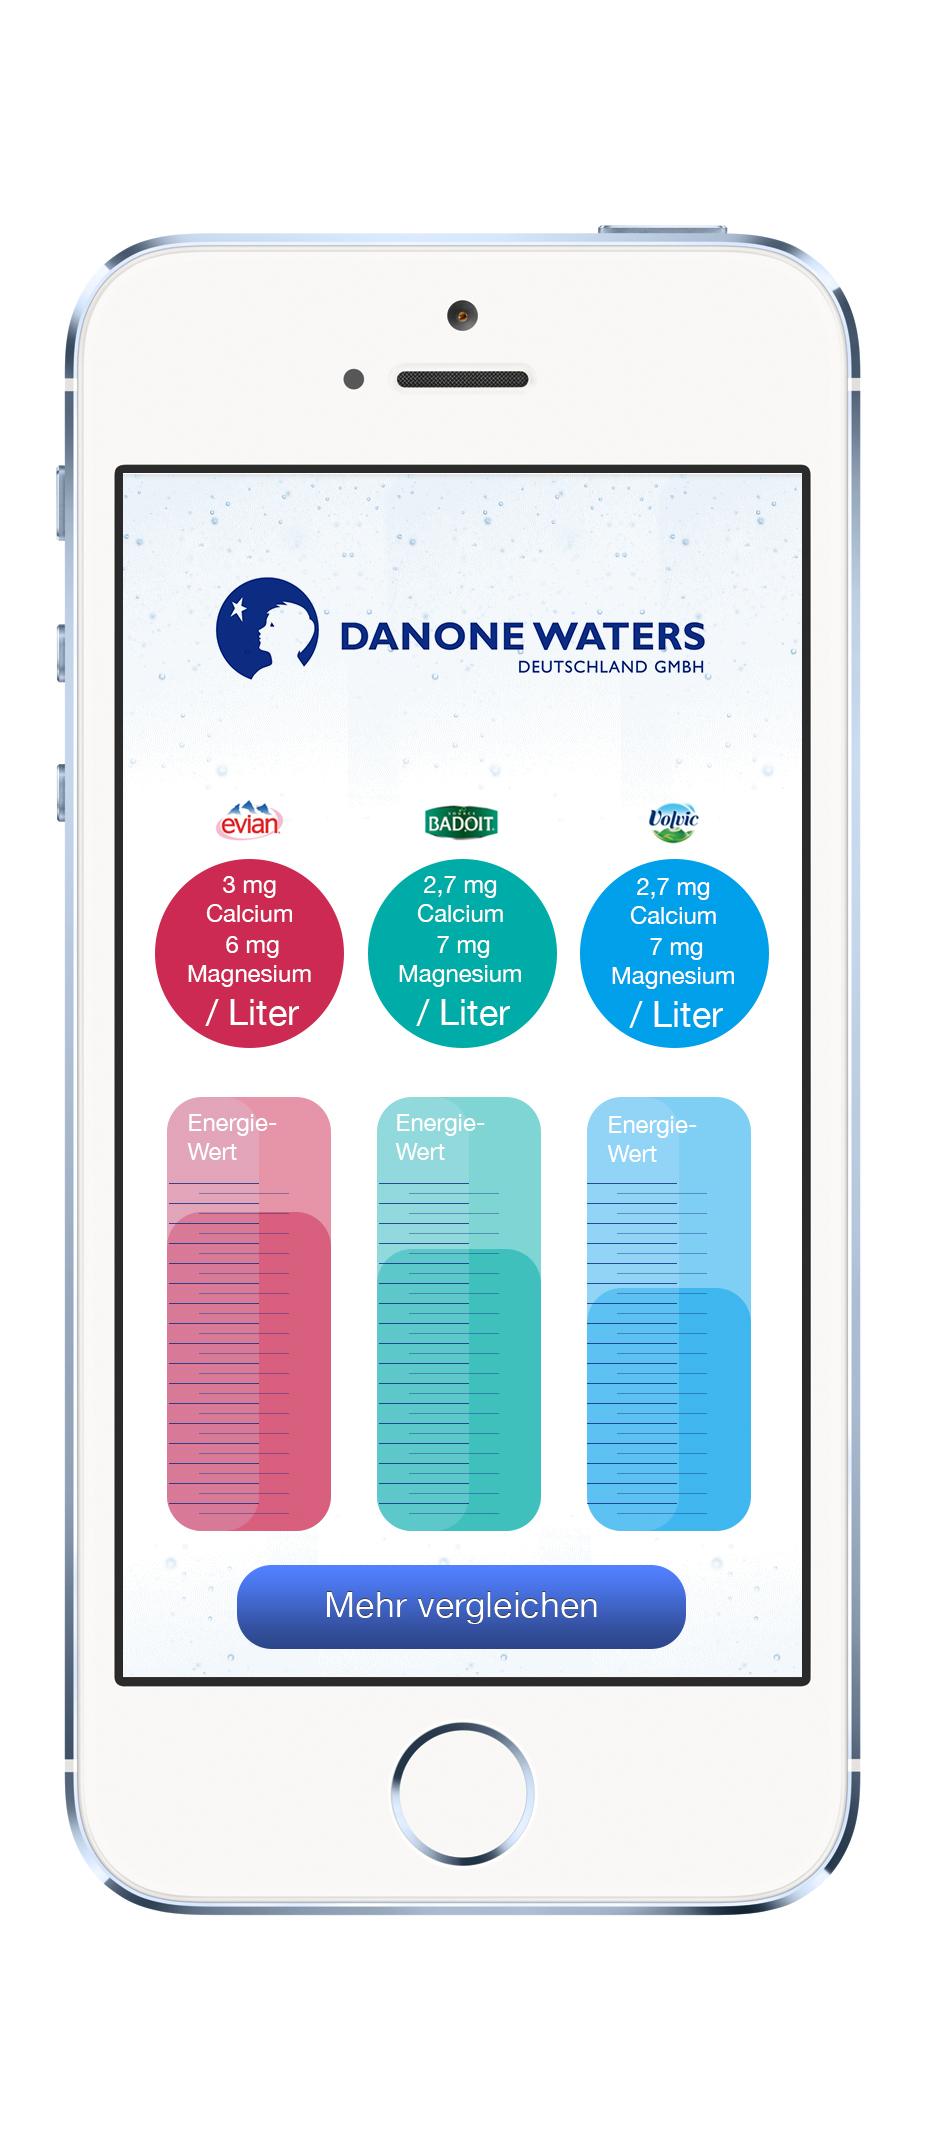 phone-app2